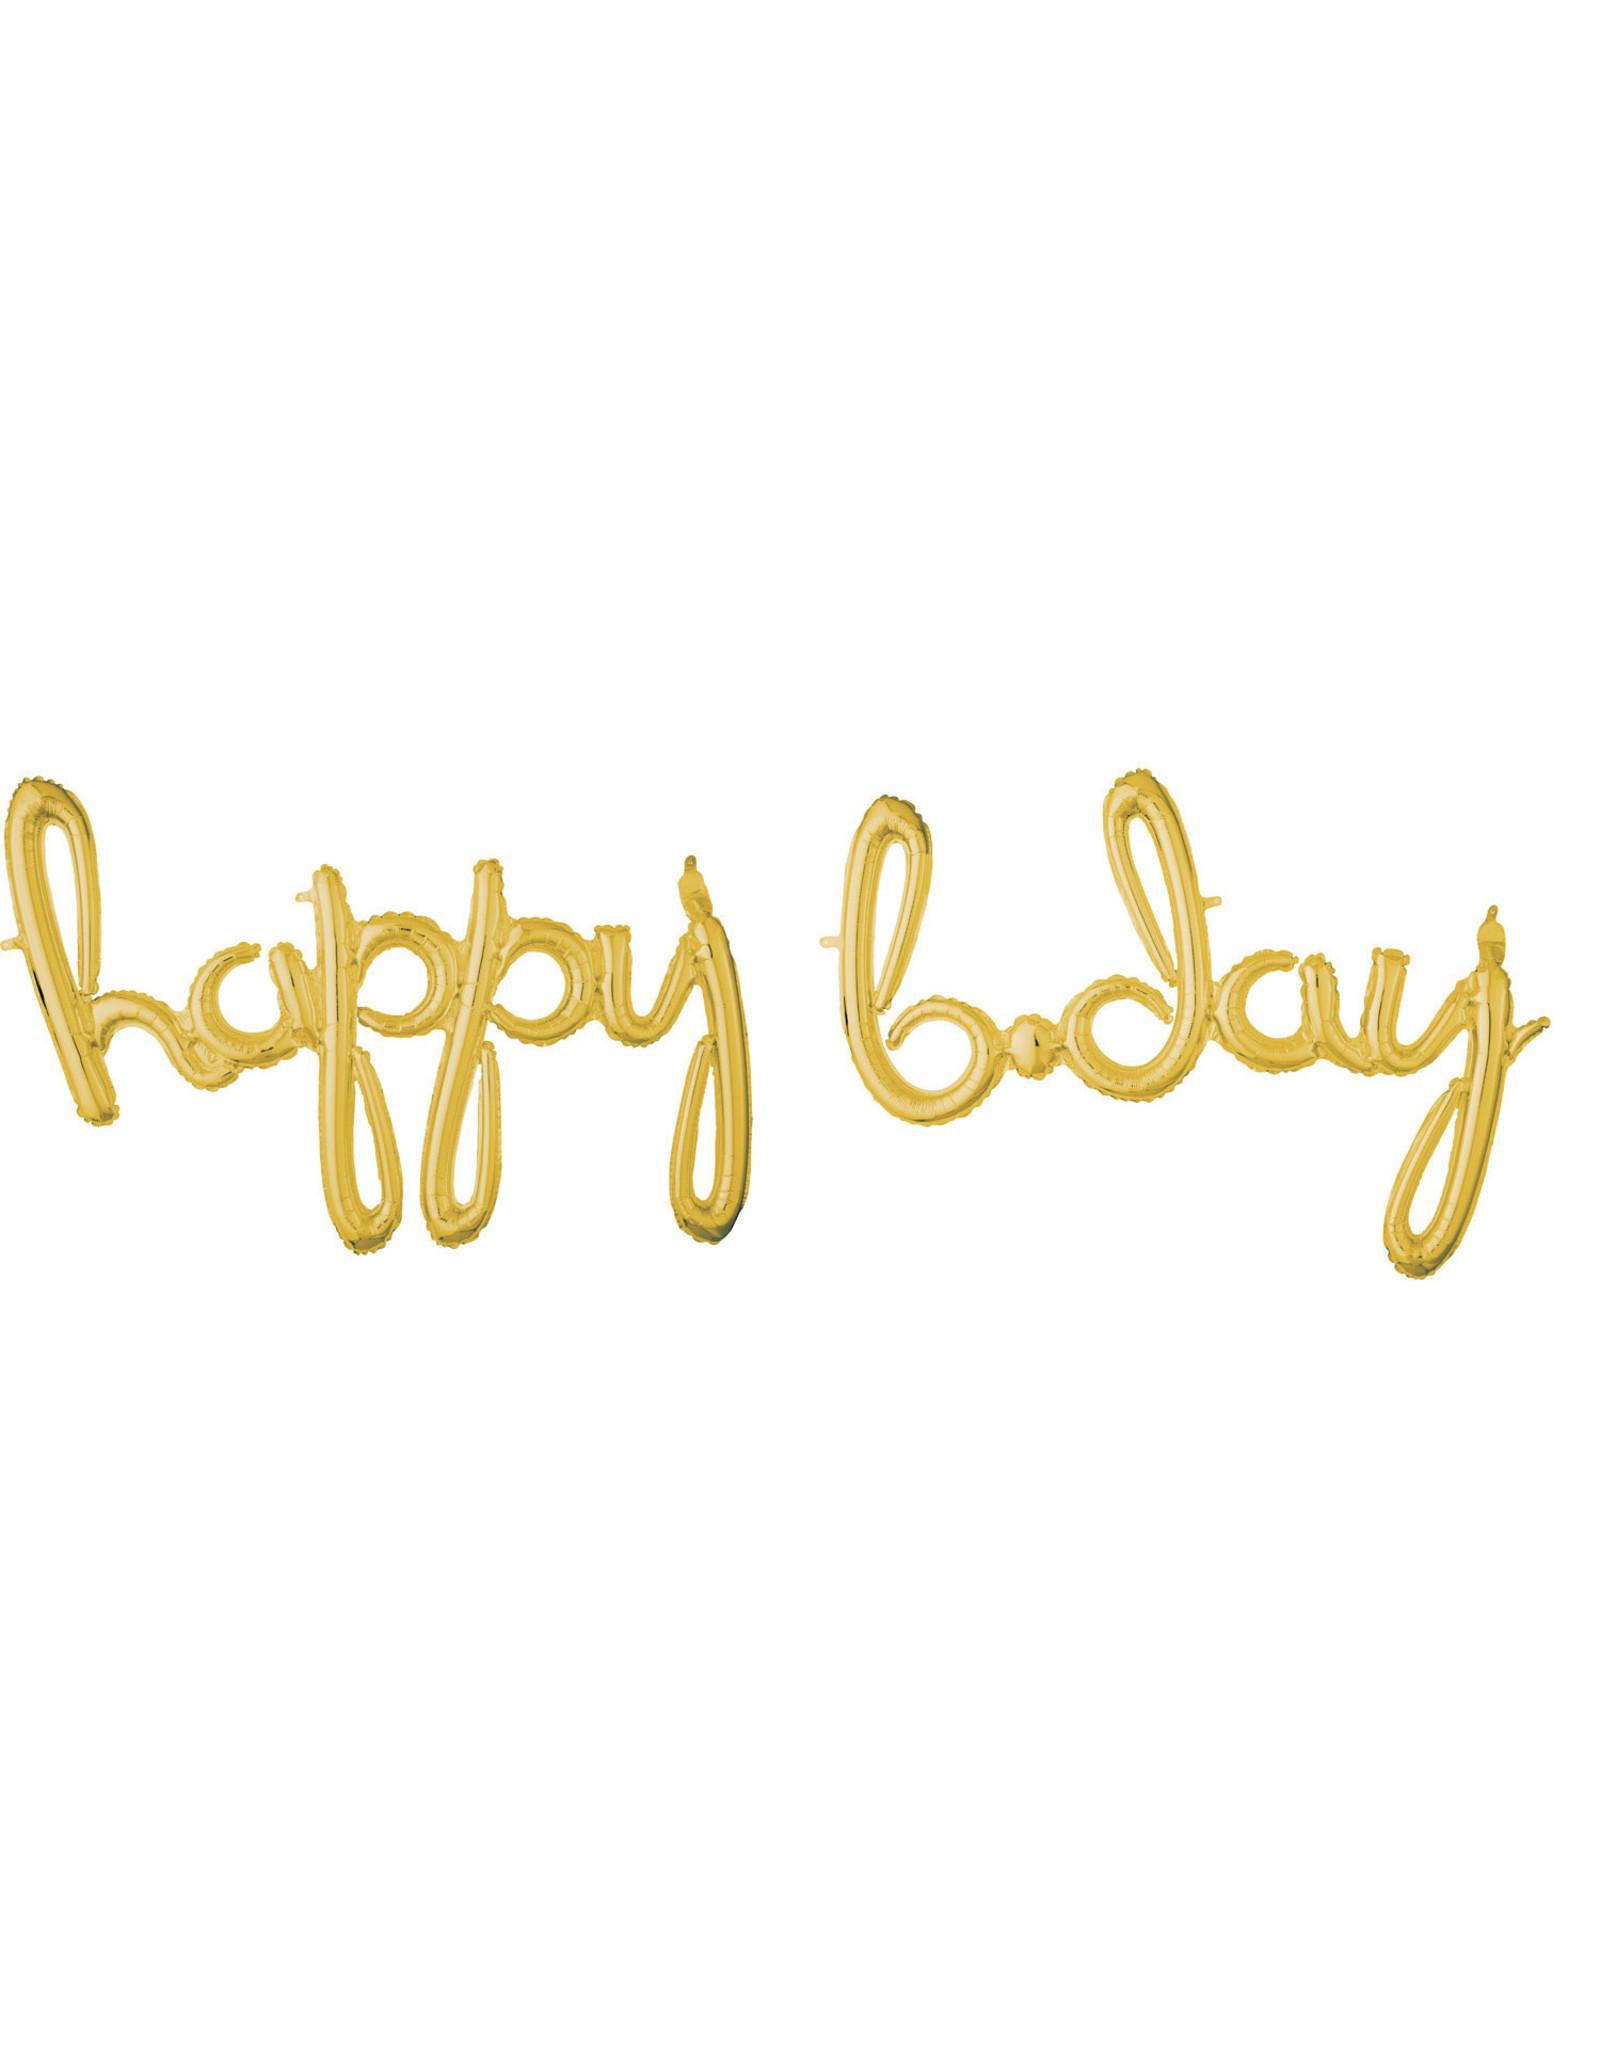 Amscan folieballon airfilled goud Happy b-day